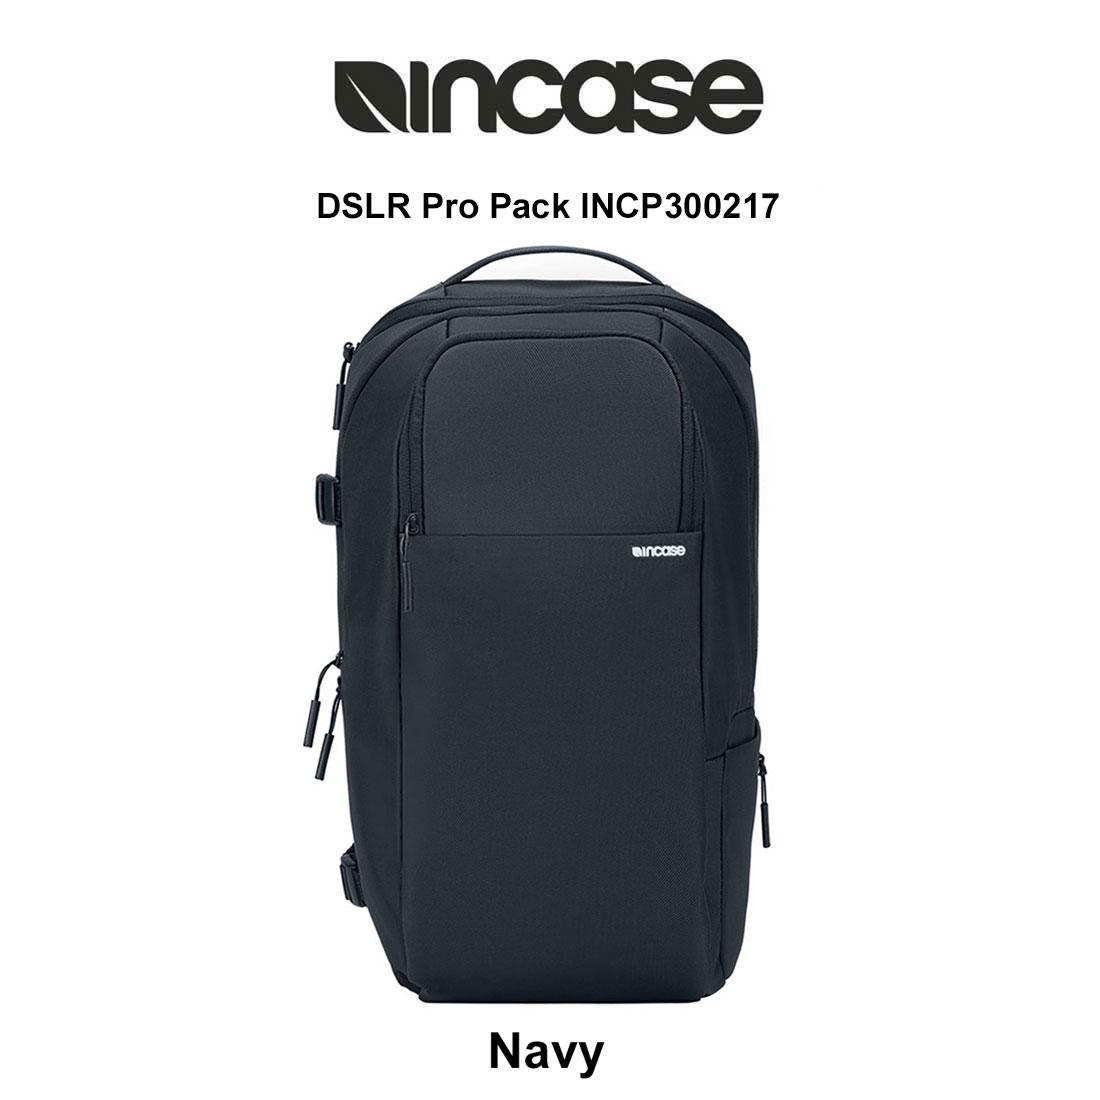 Incase(インケース)カメラ 一眼レフ バックパック DSLR Pro Pack INCP300217